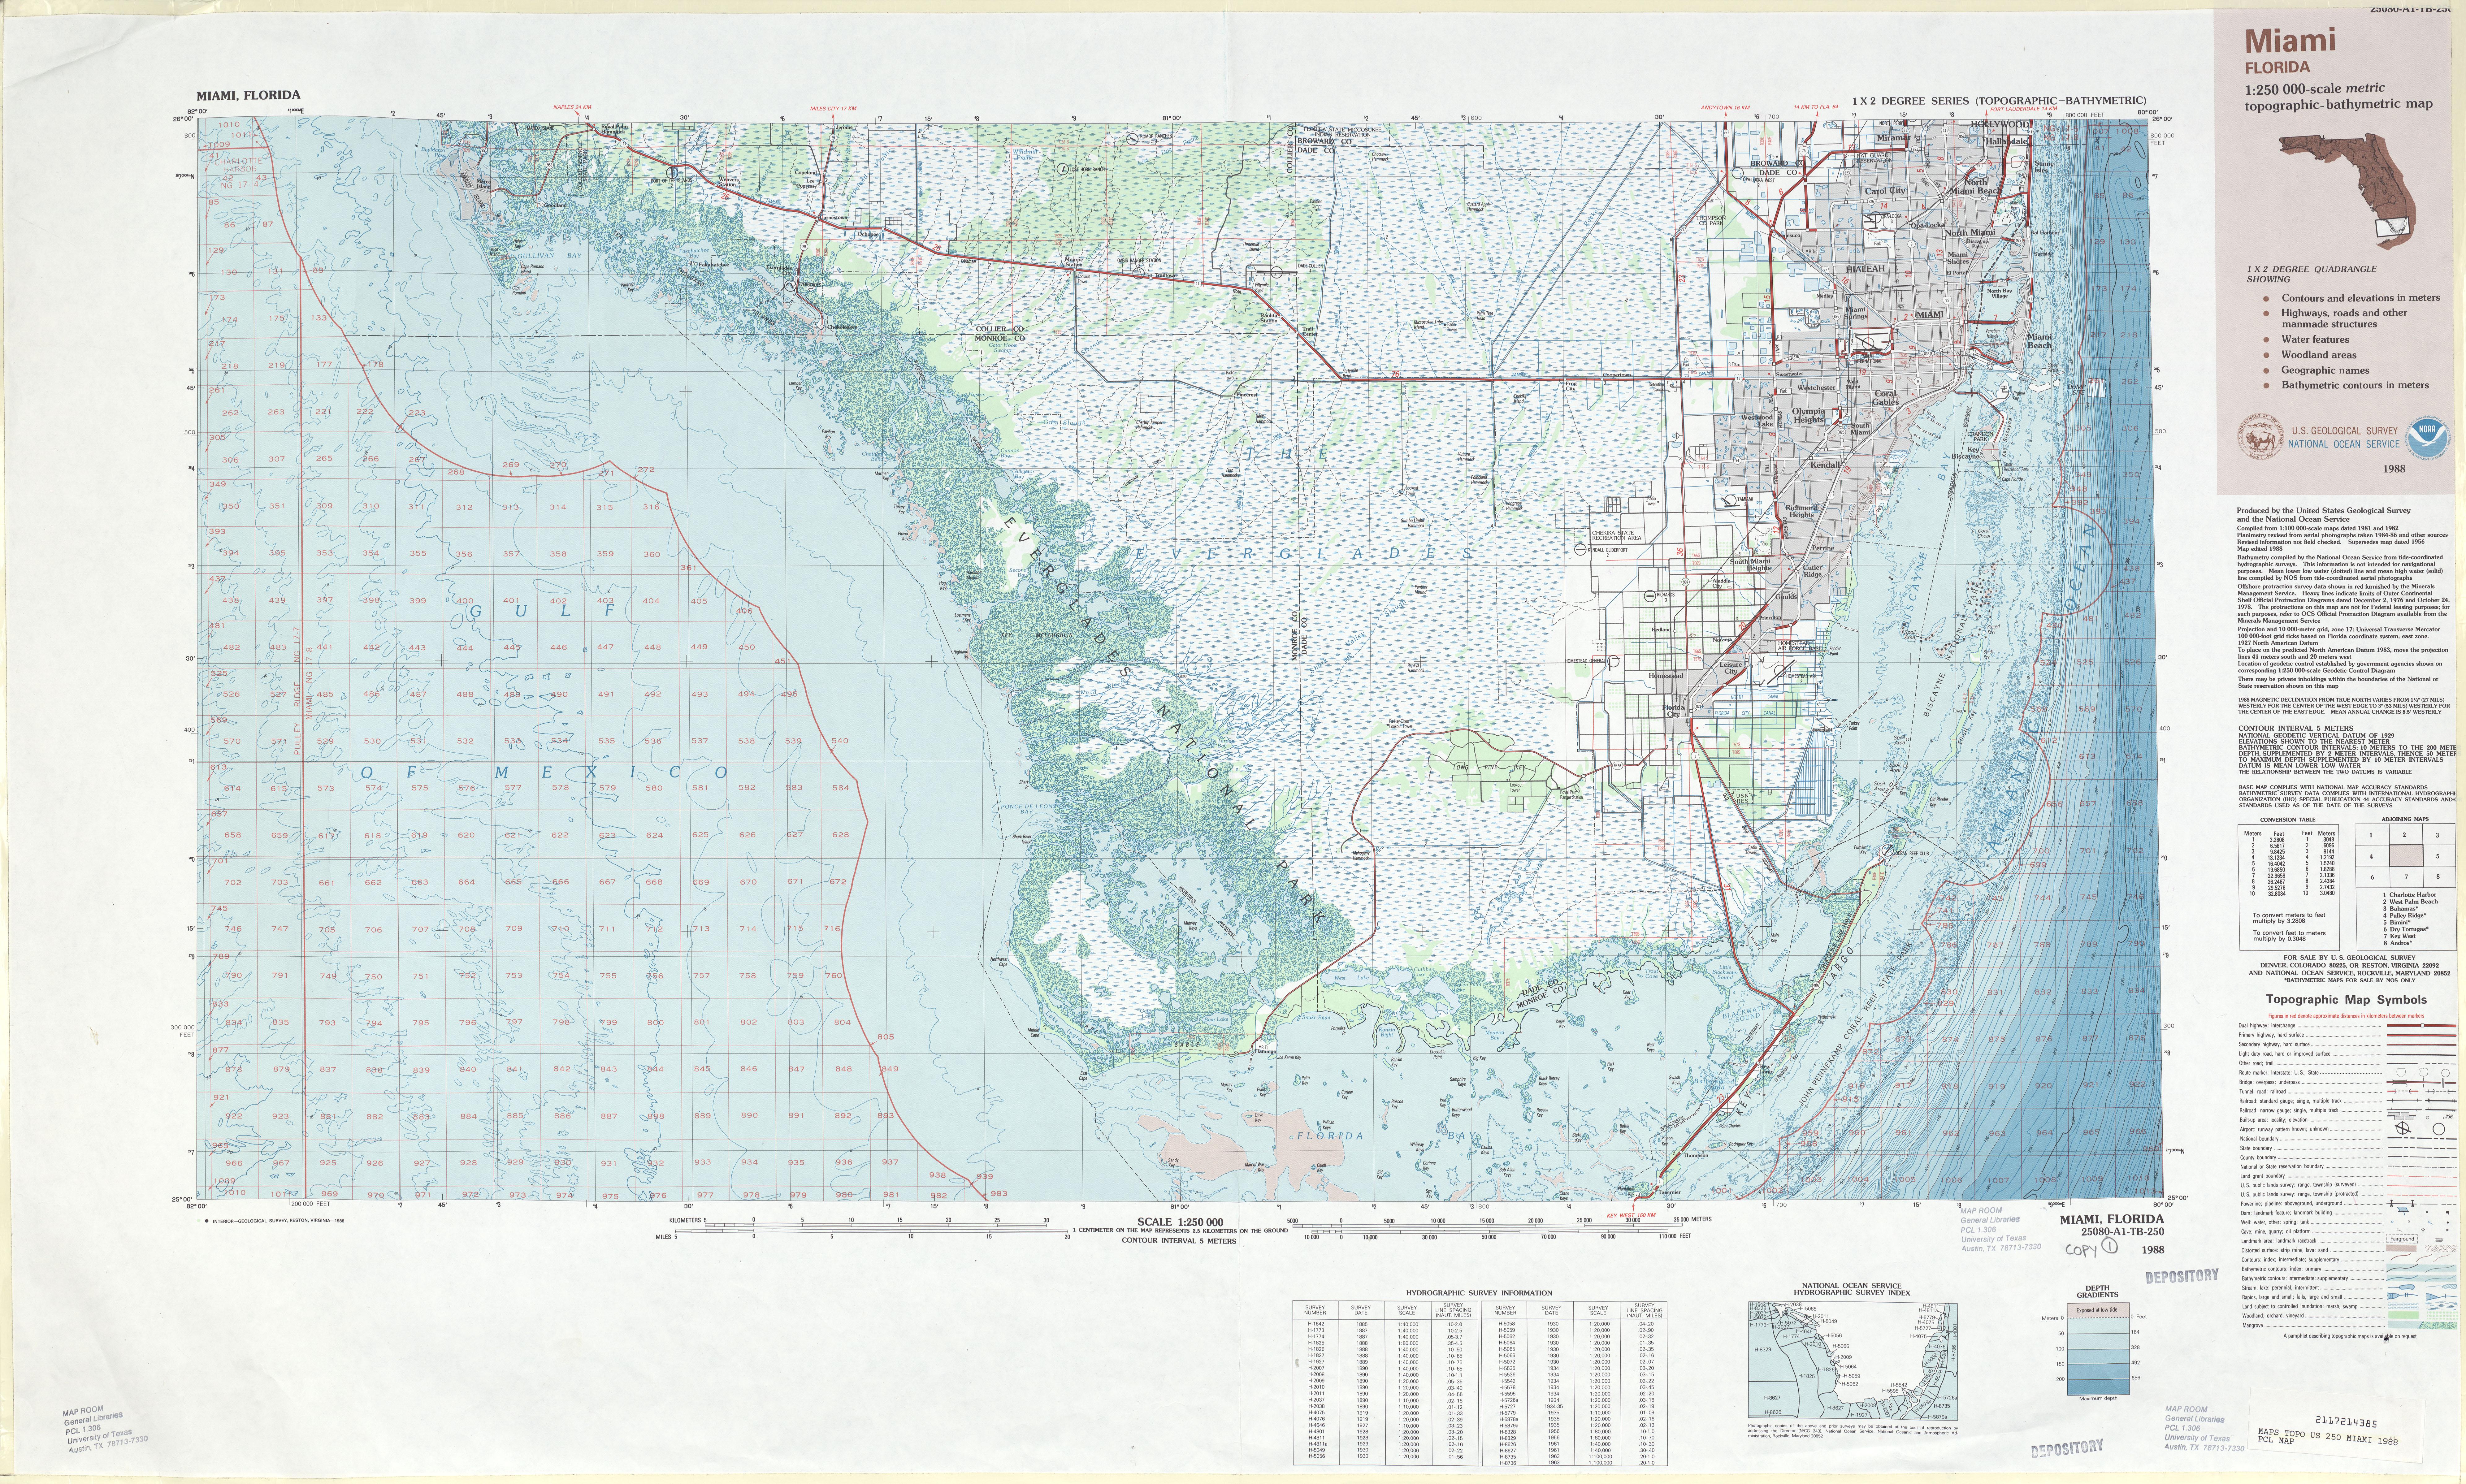 Miami Topographic-Bathymetric Map Sheet, United States 1988